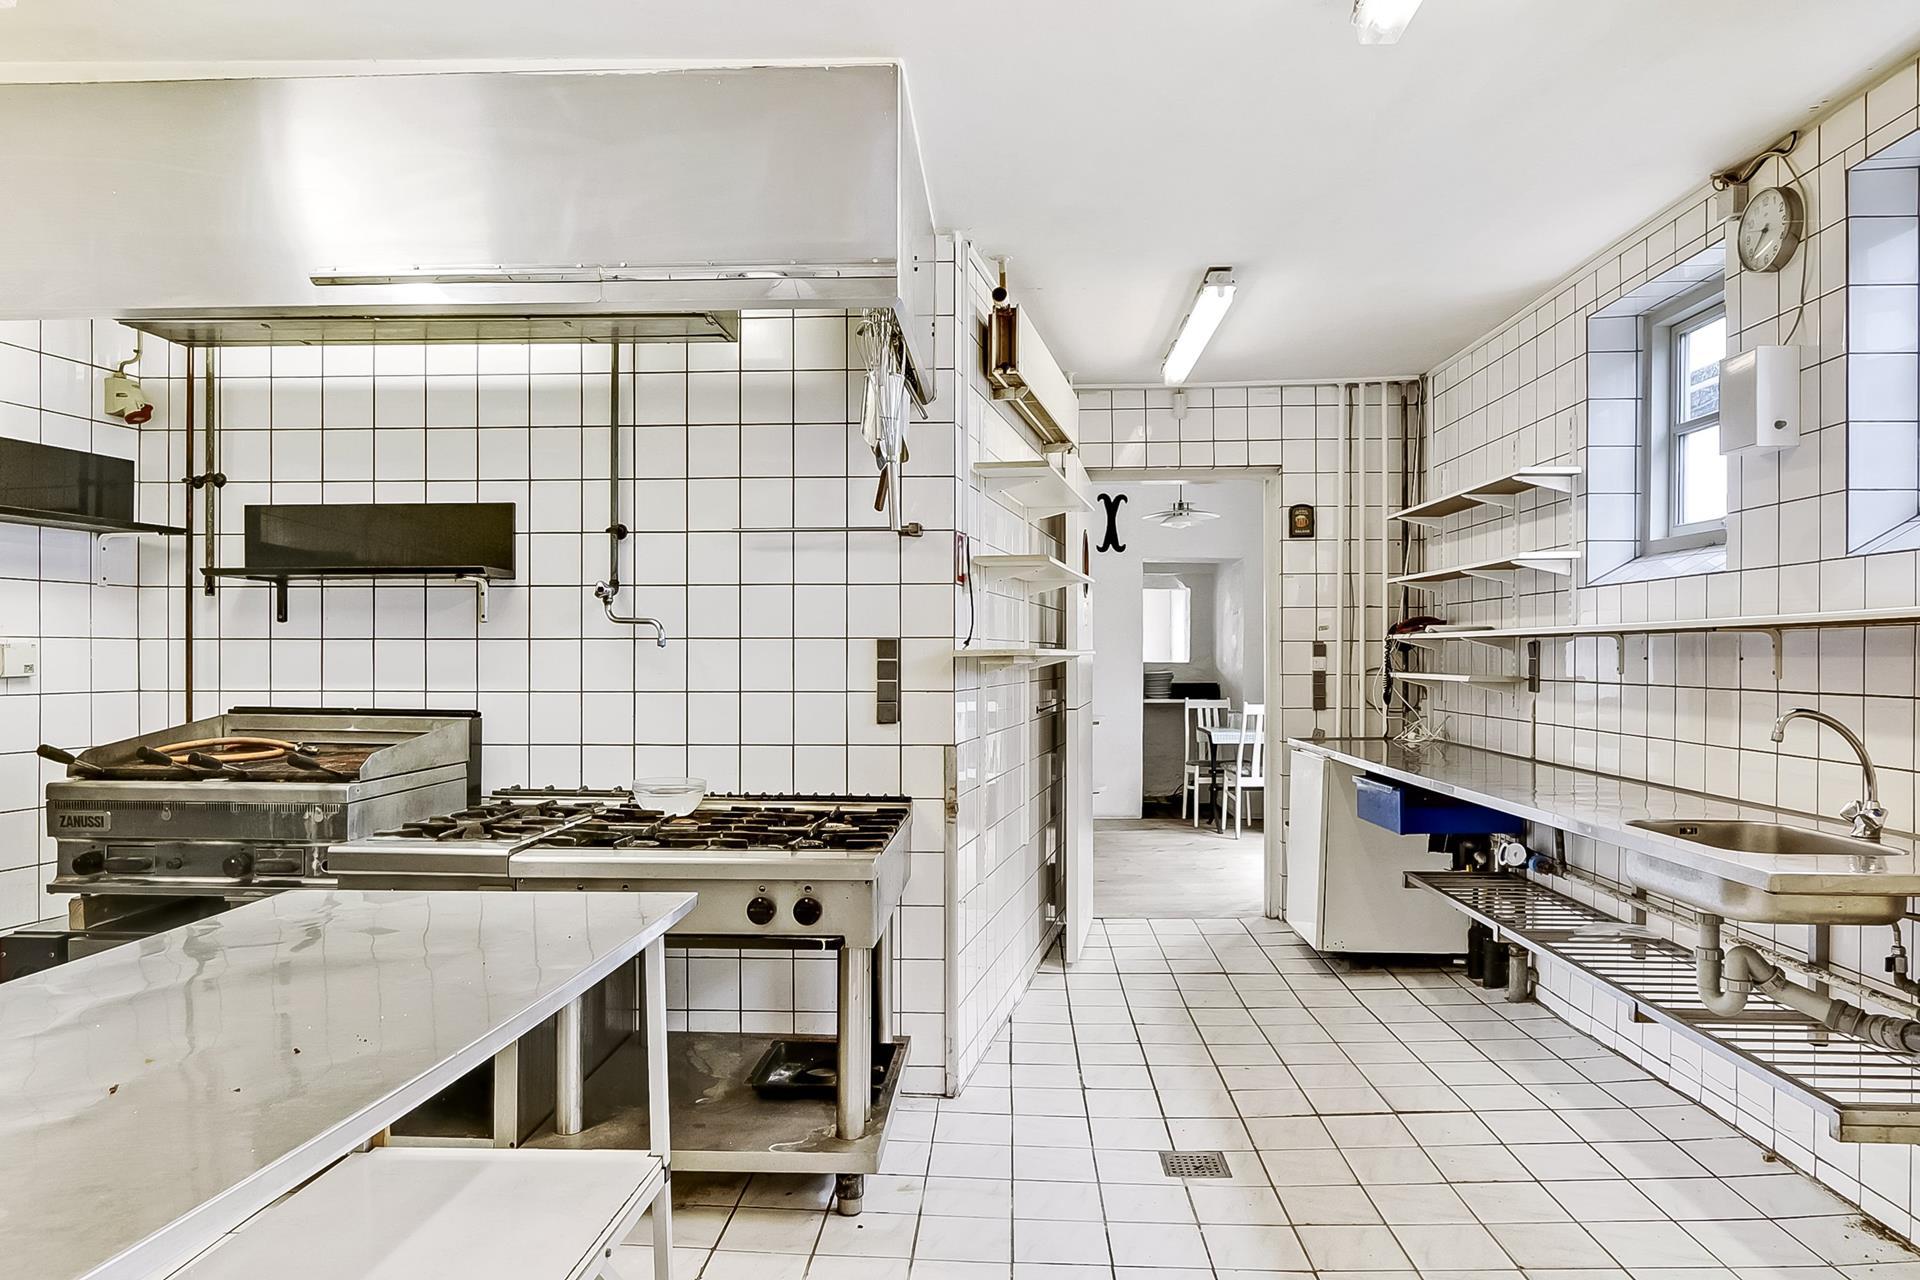 Bolig/erhverv på Jessens Mole i Svendborg - Køkken